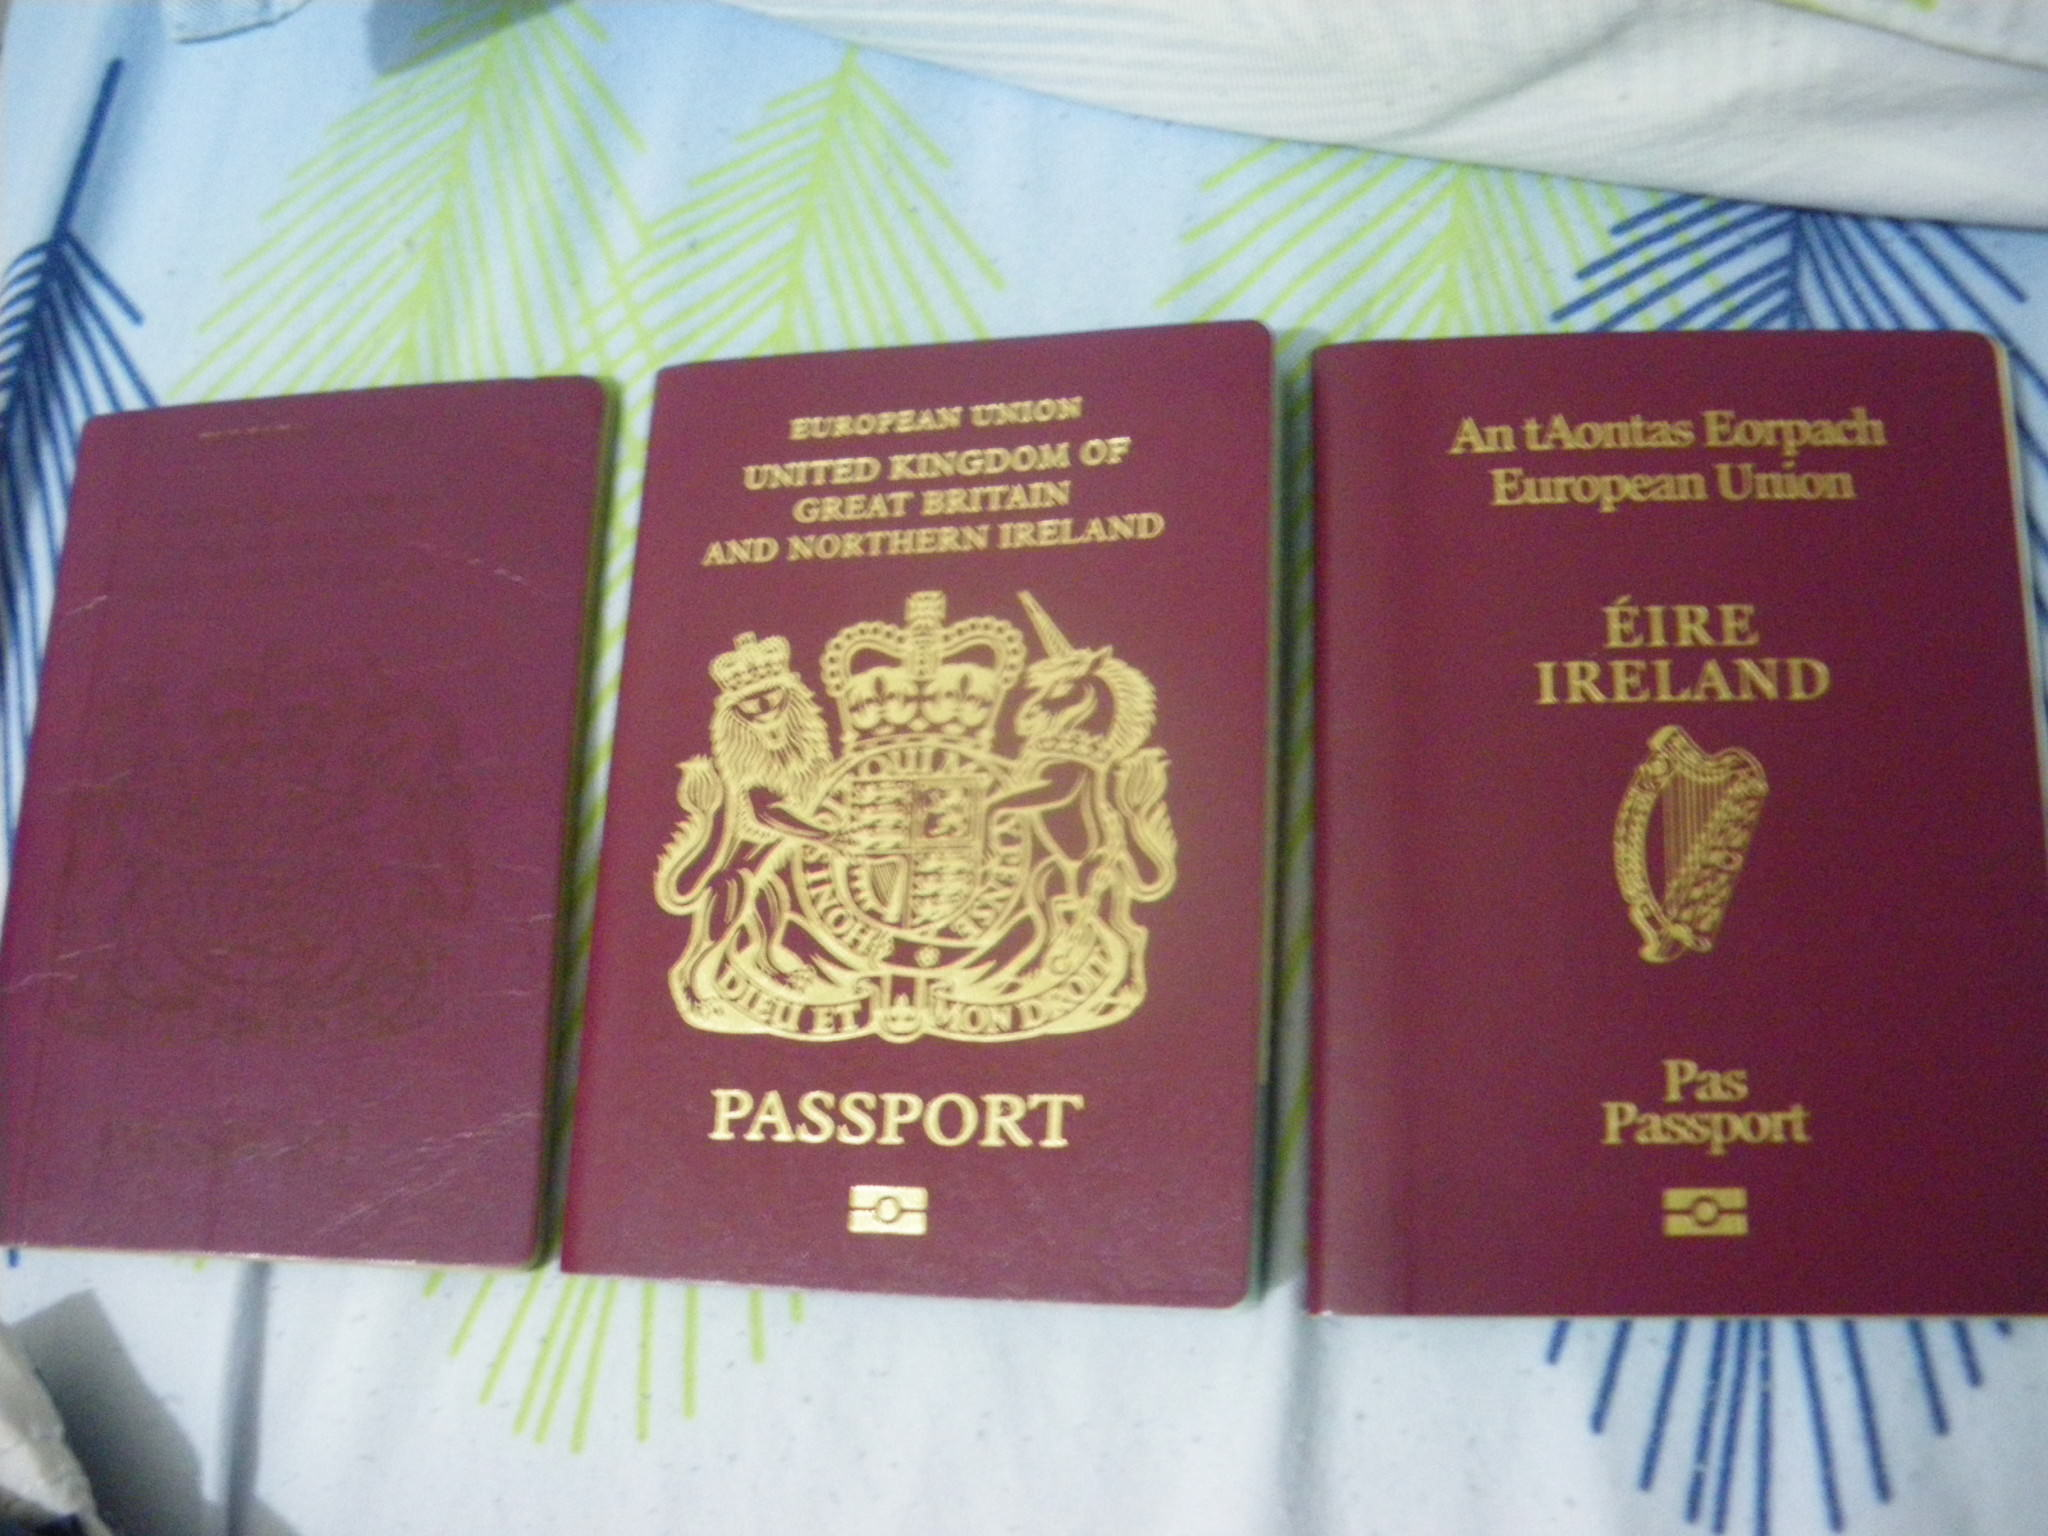 Tuesday's Travel Essentials: Photocopies of Passports